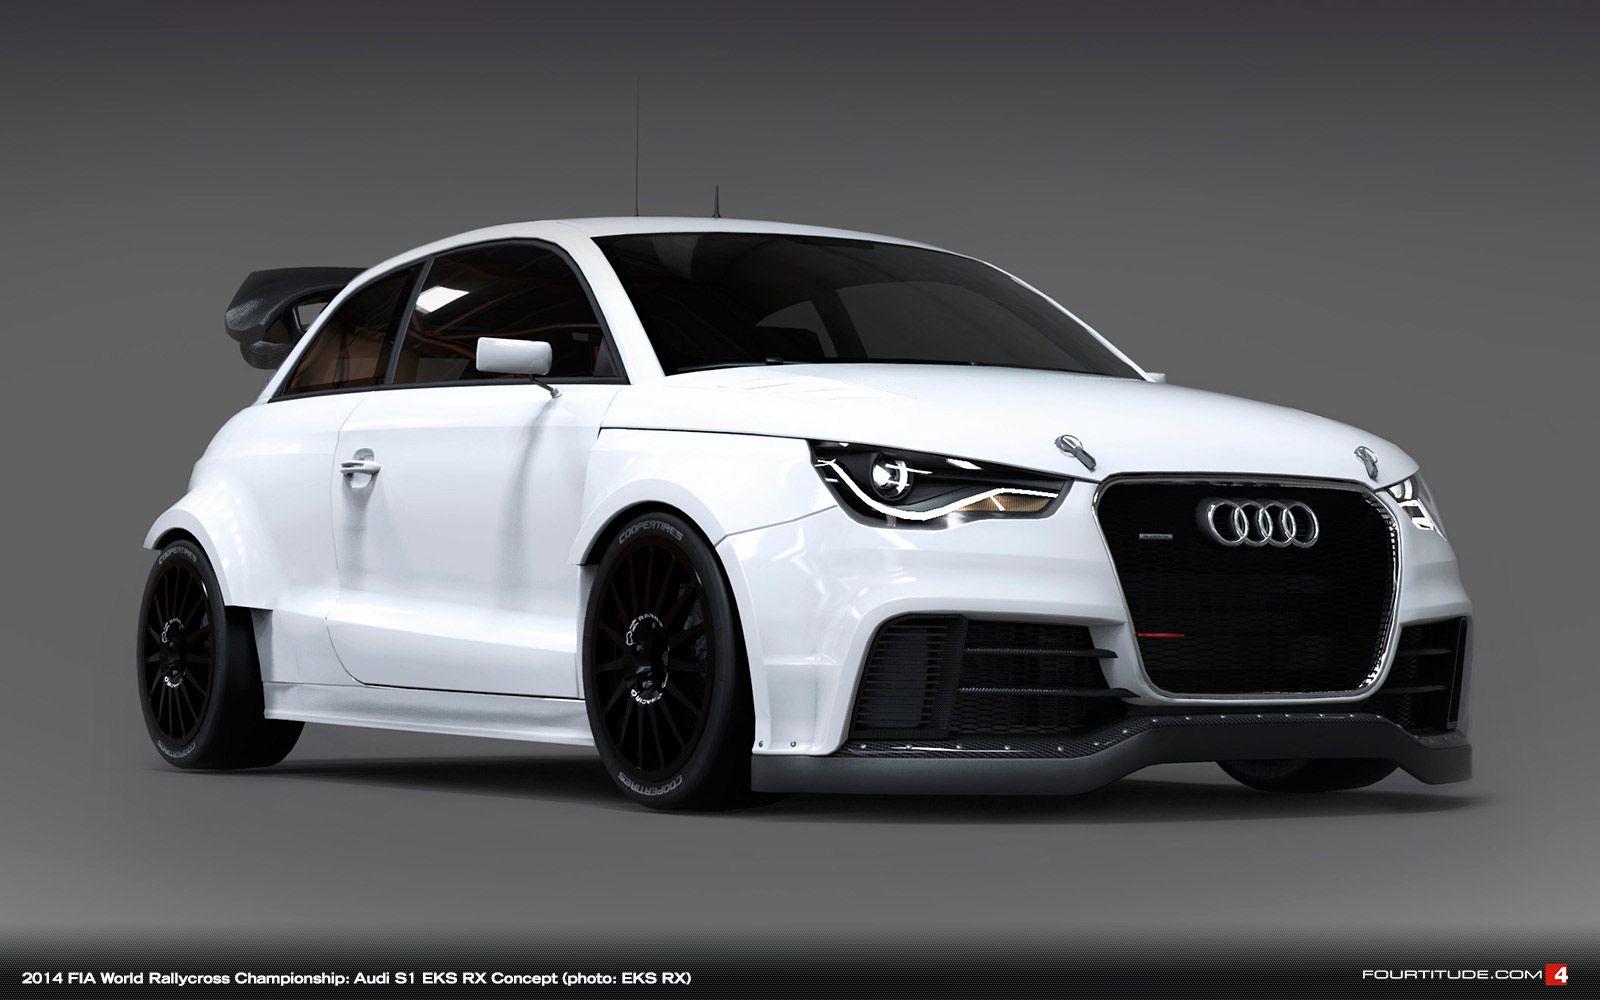 Audi Rs1 Www Asautoparts Com Audi Super Cars Audi A1 Rally Car